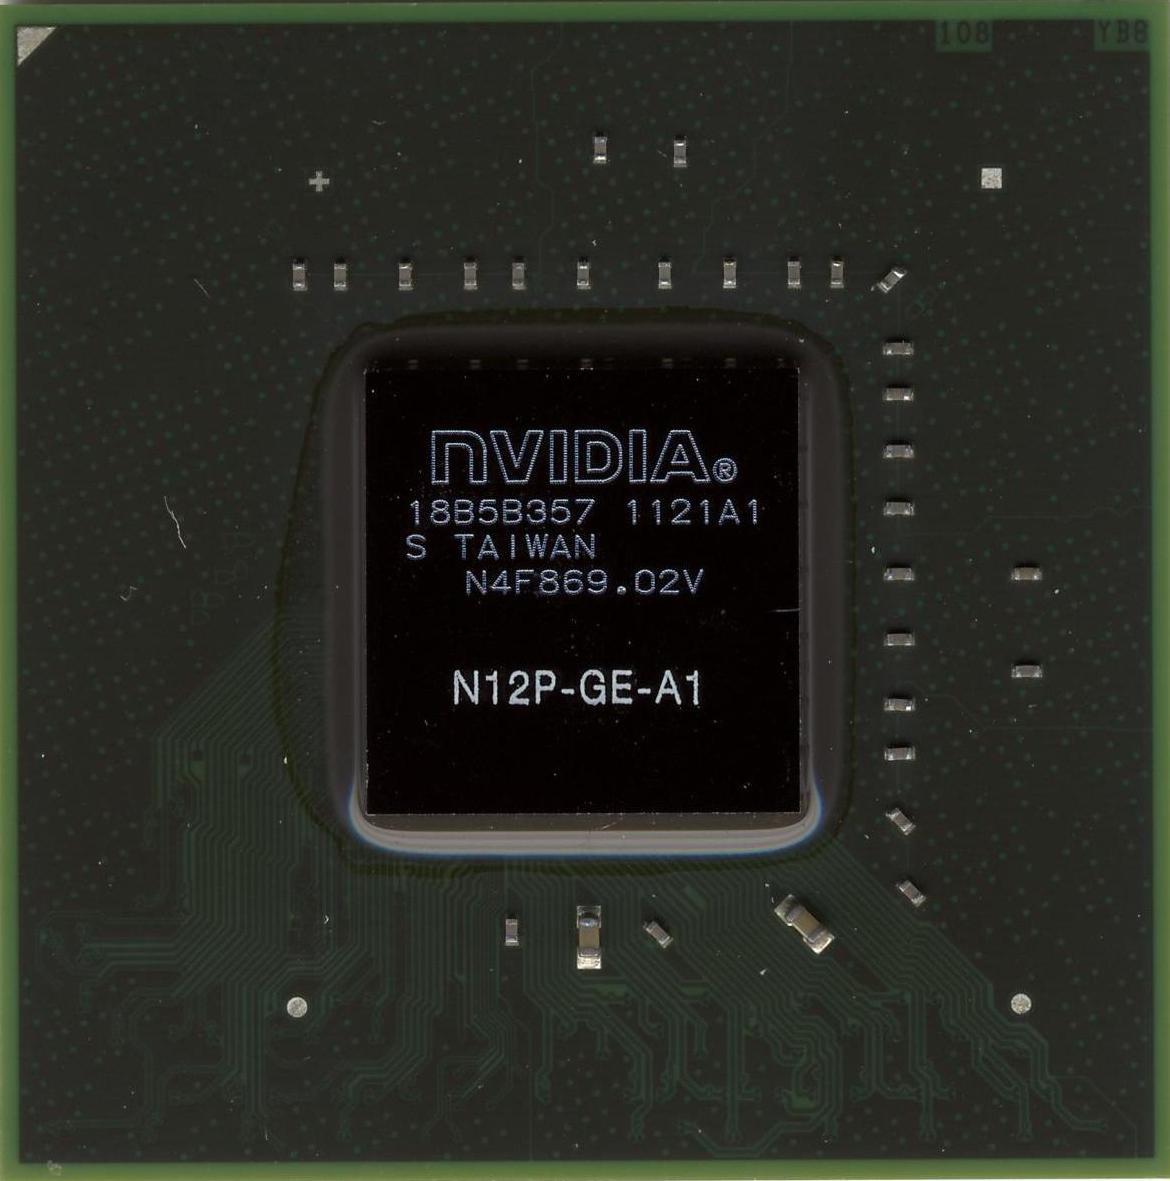 N12P-GE-A1 nVidia GT525M